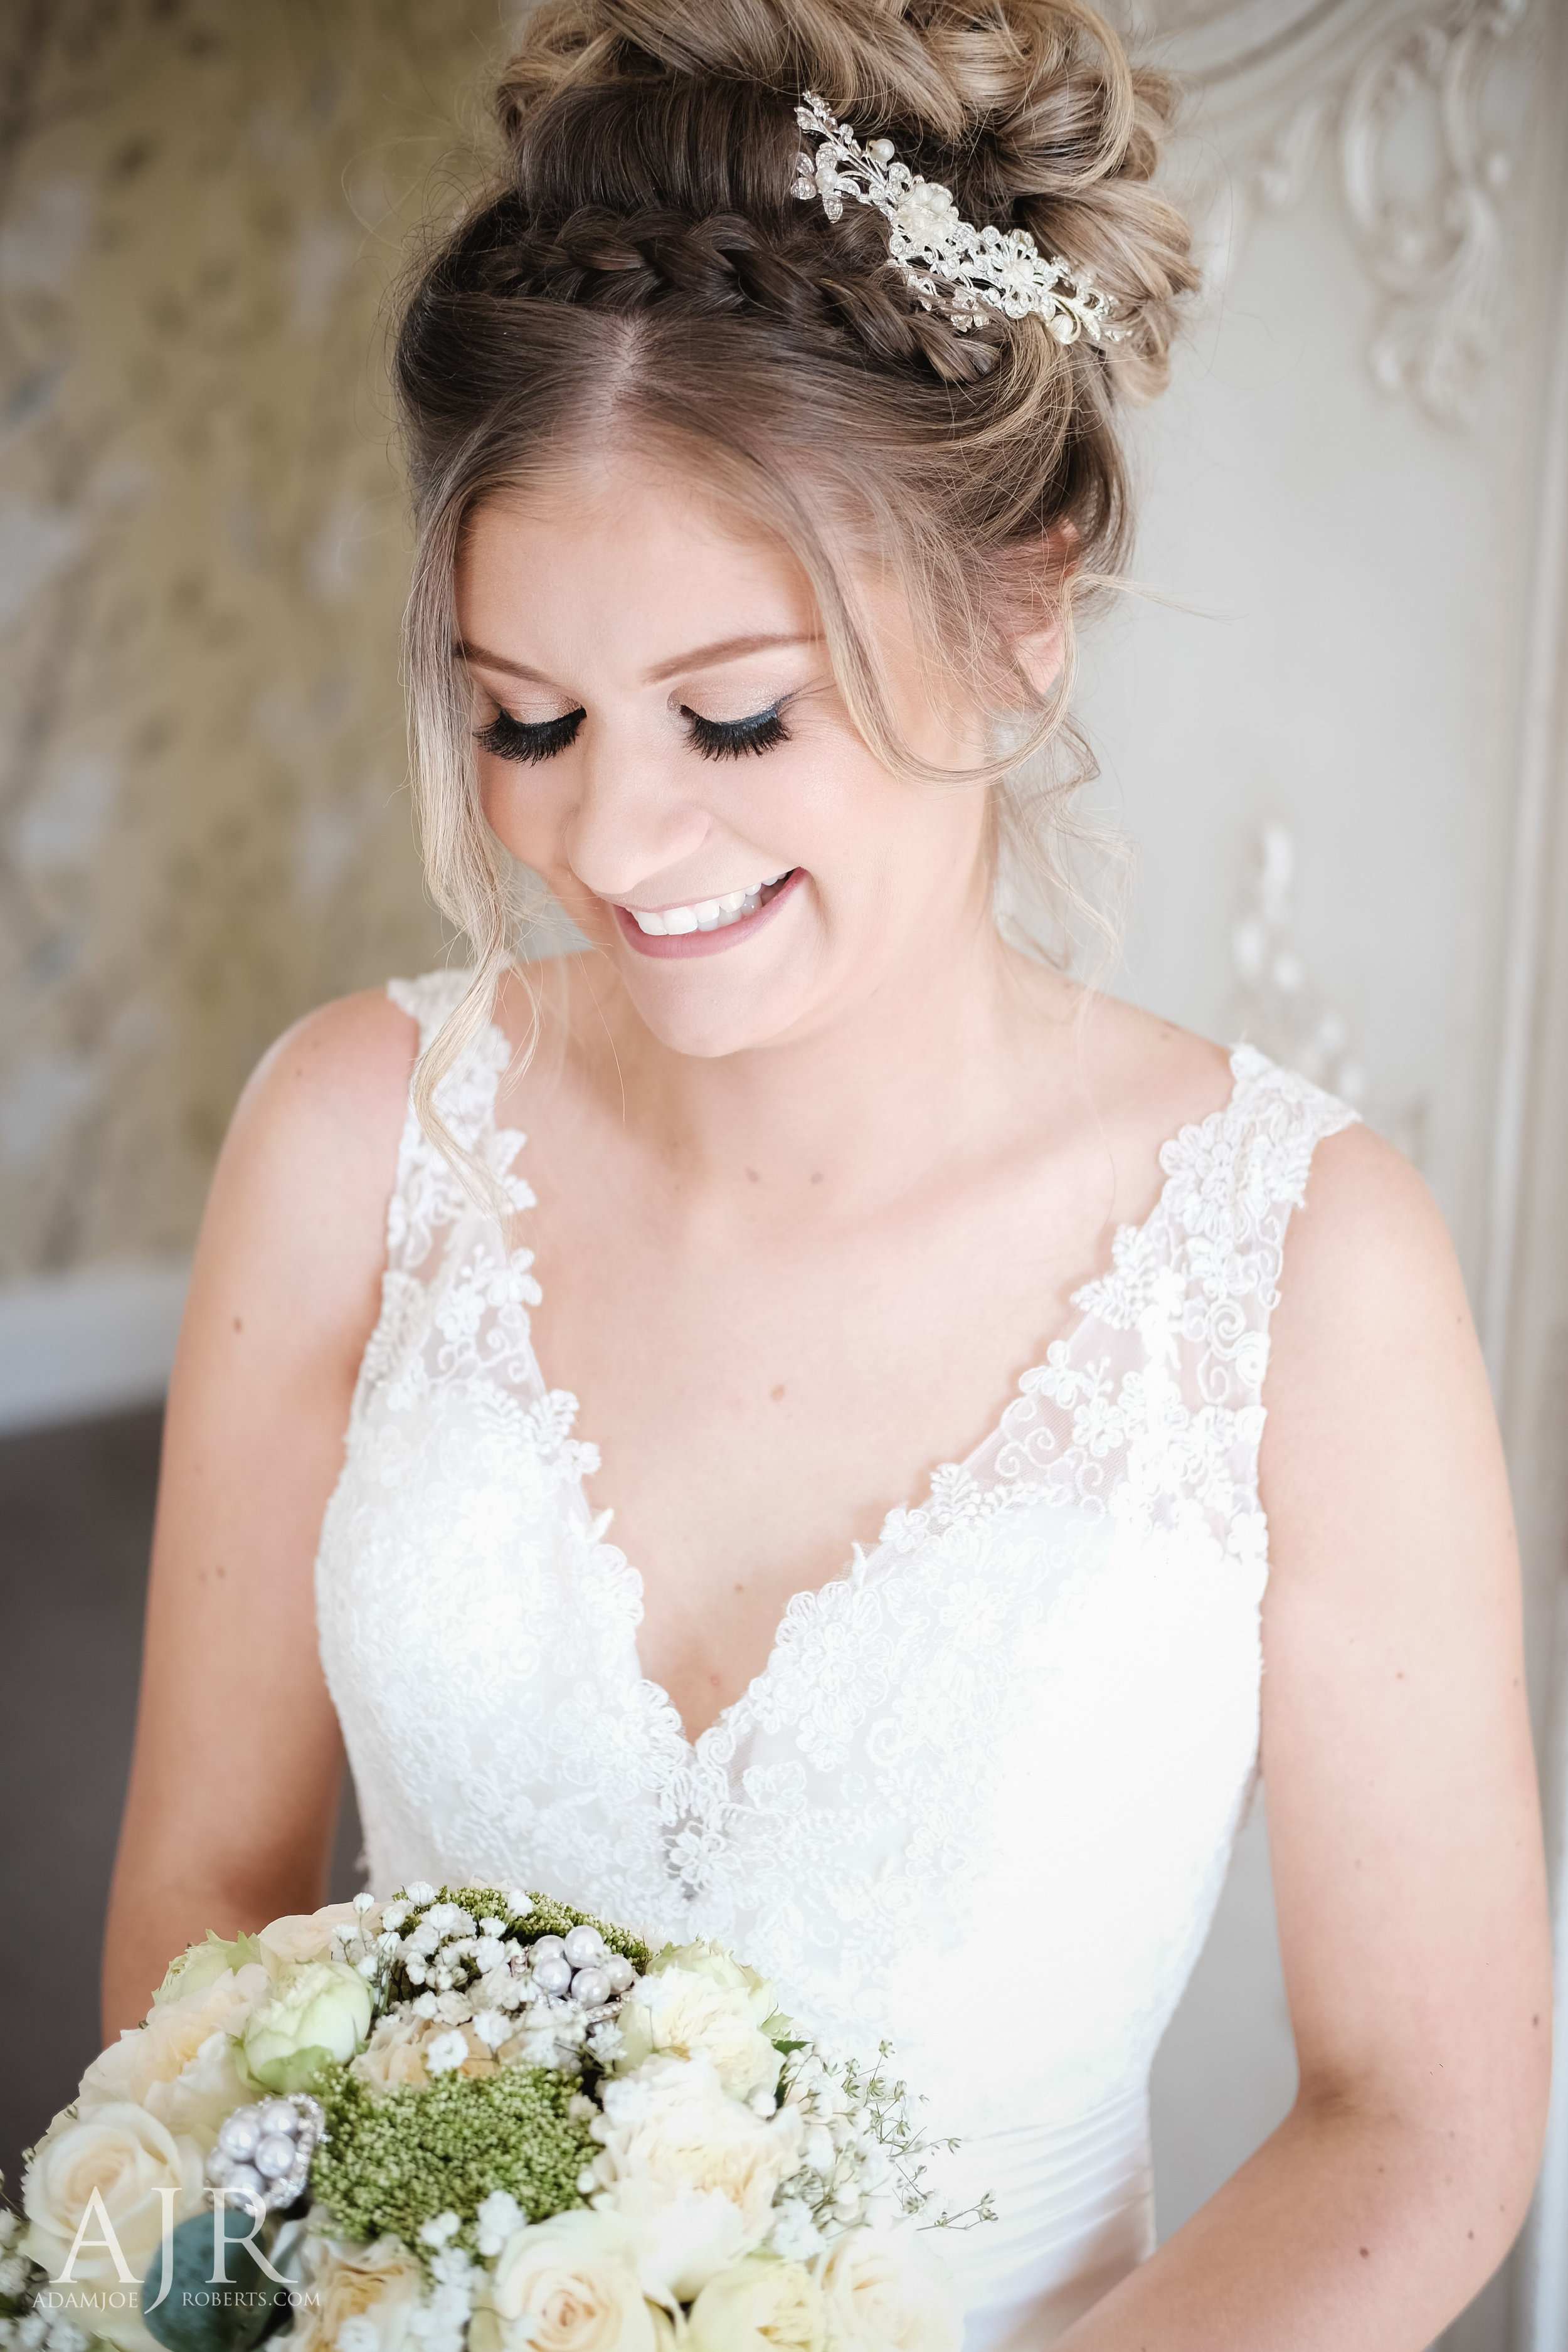 Eaves hall documenrty wedding photography | widnes cheshire wedding photographer sneak peek (1 of 11).jpg